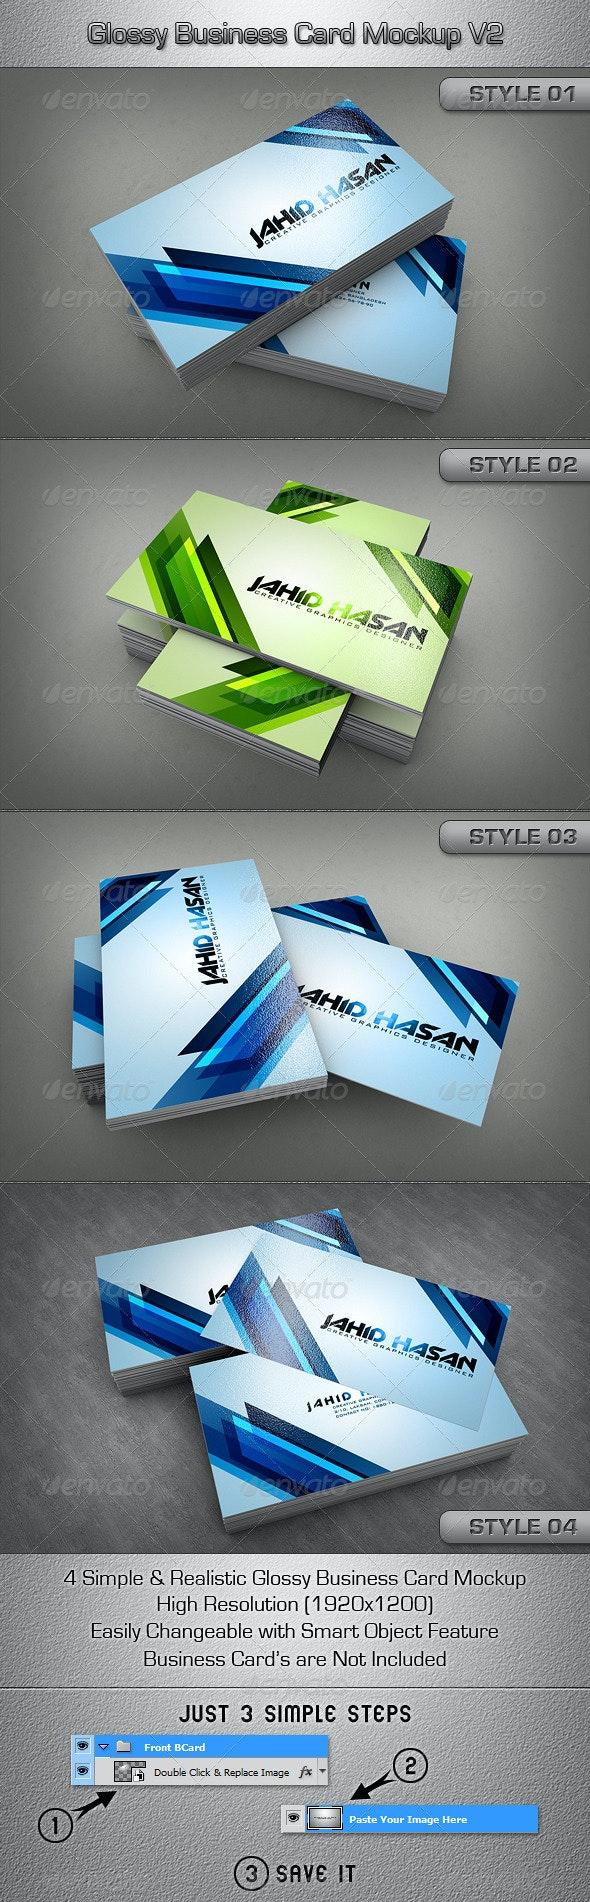 Glossy Business Card MockUp V2 - Business Cards Print